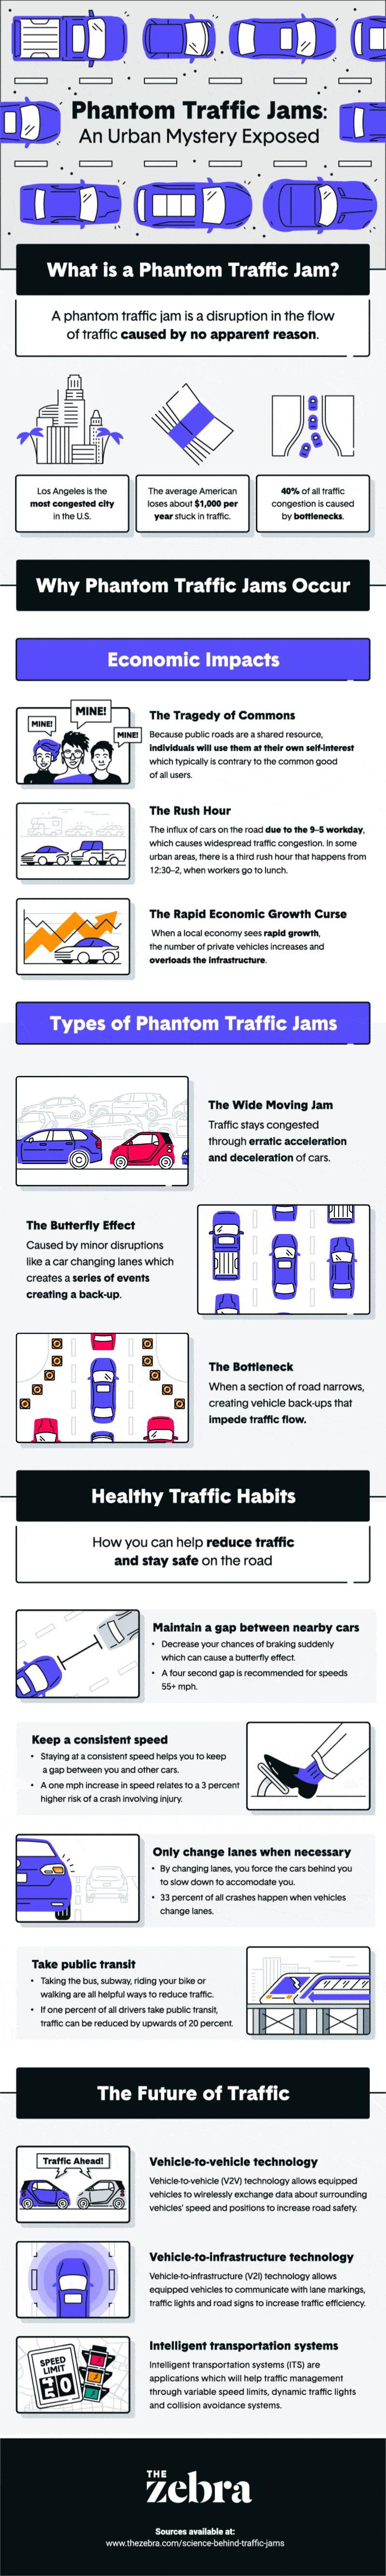 What's Behind Phantom Traffic Jams? - Real Estate Investing